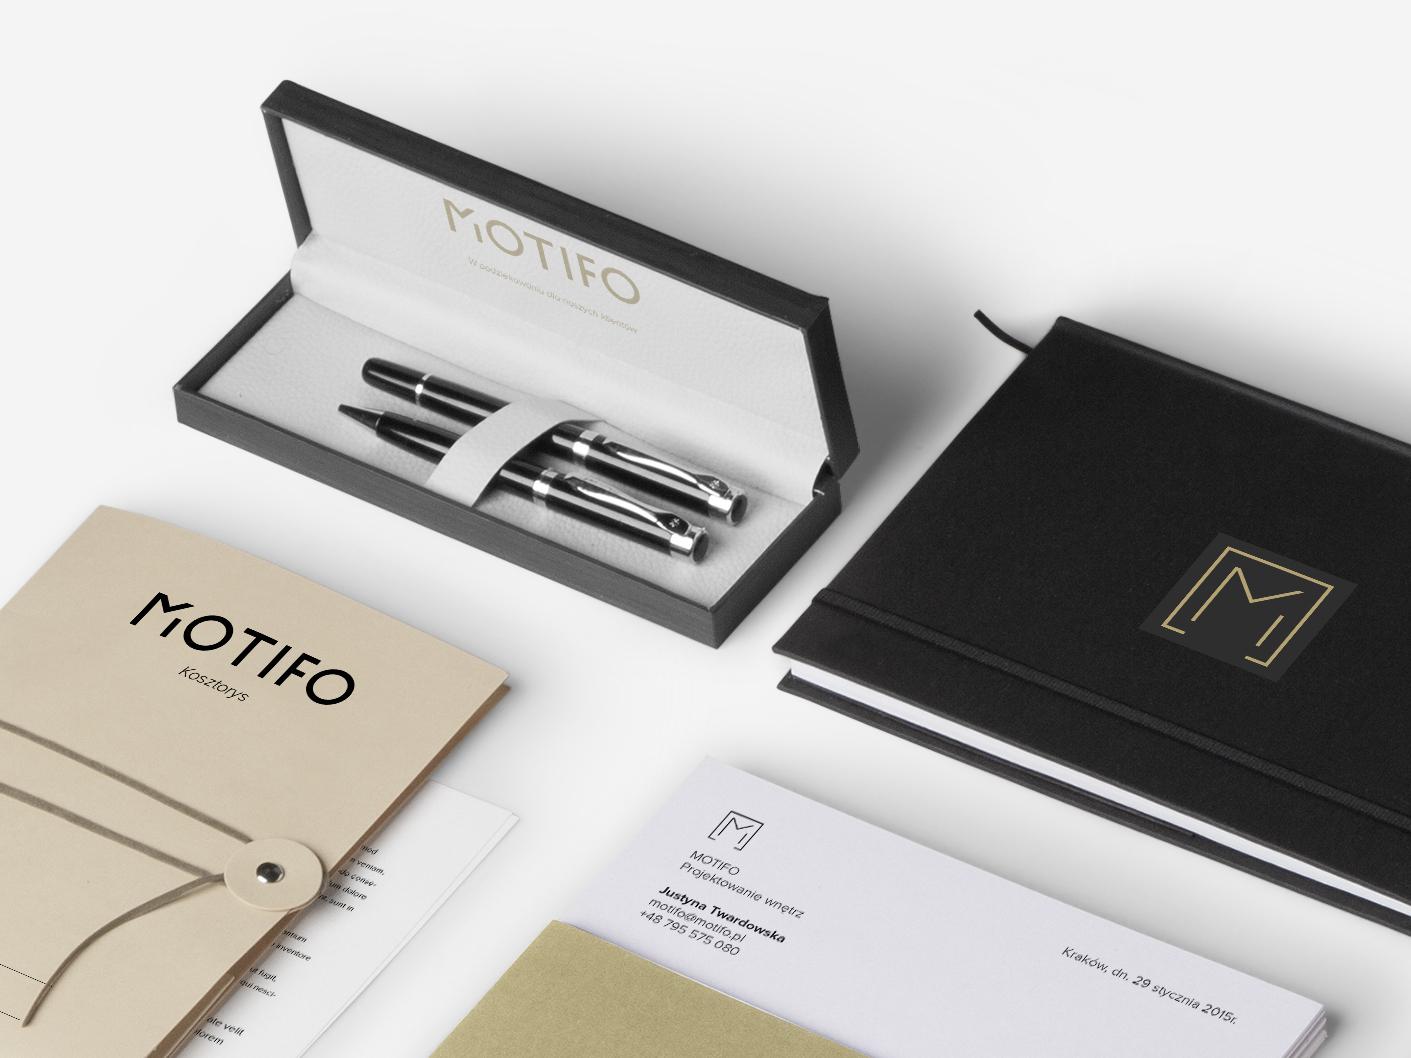 MOTIFO Interior Design Architect Branding Website on Behance